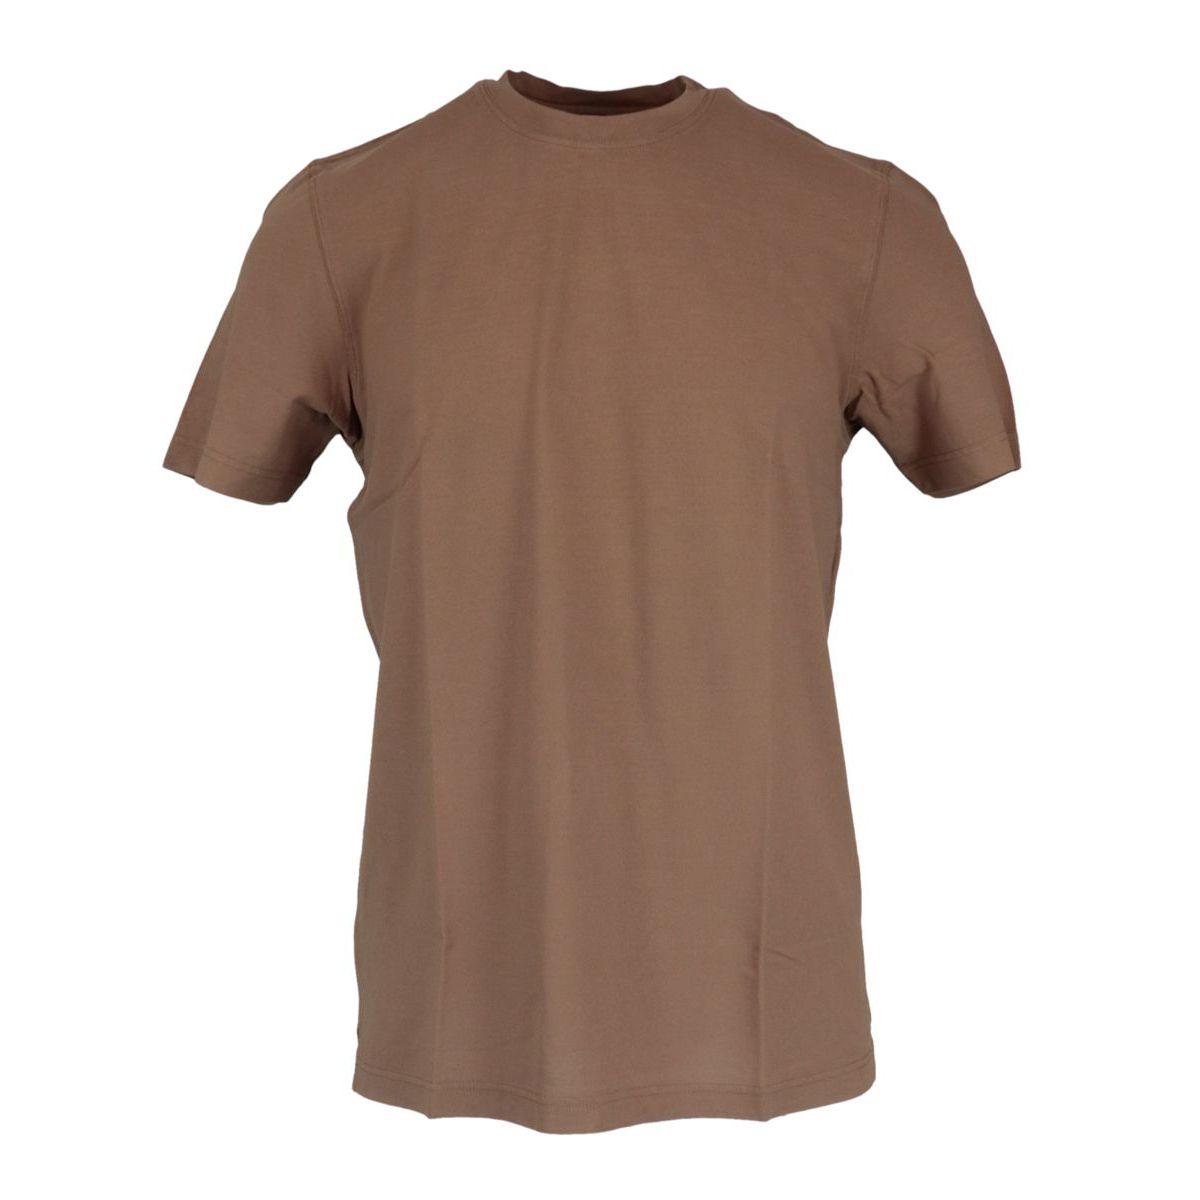 Crew neck t-shirt in ice cotton Beaver Gran Sasso